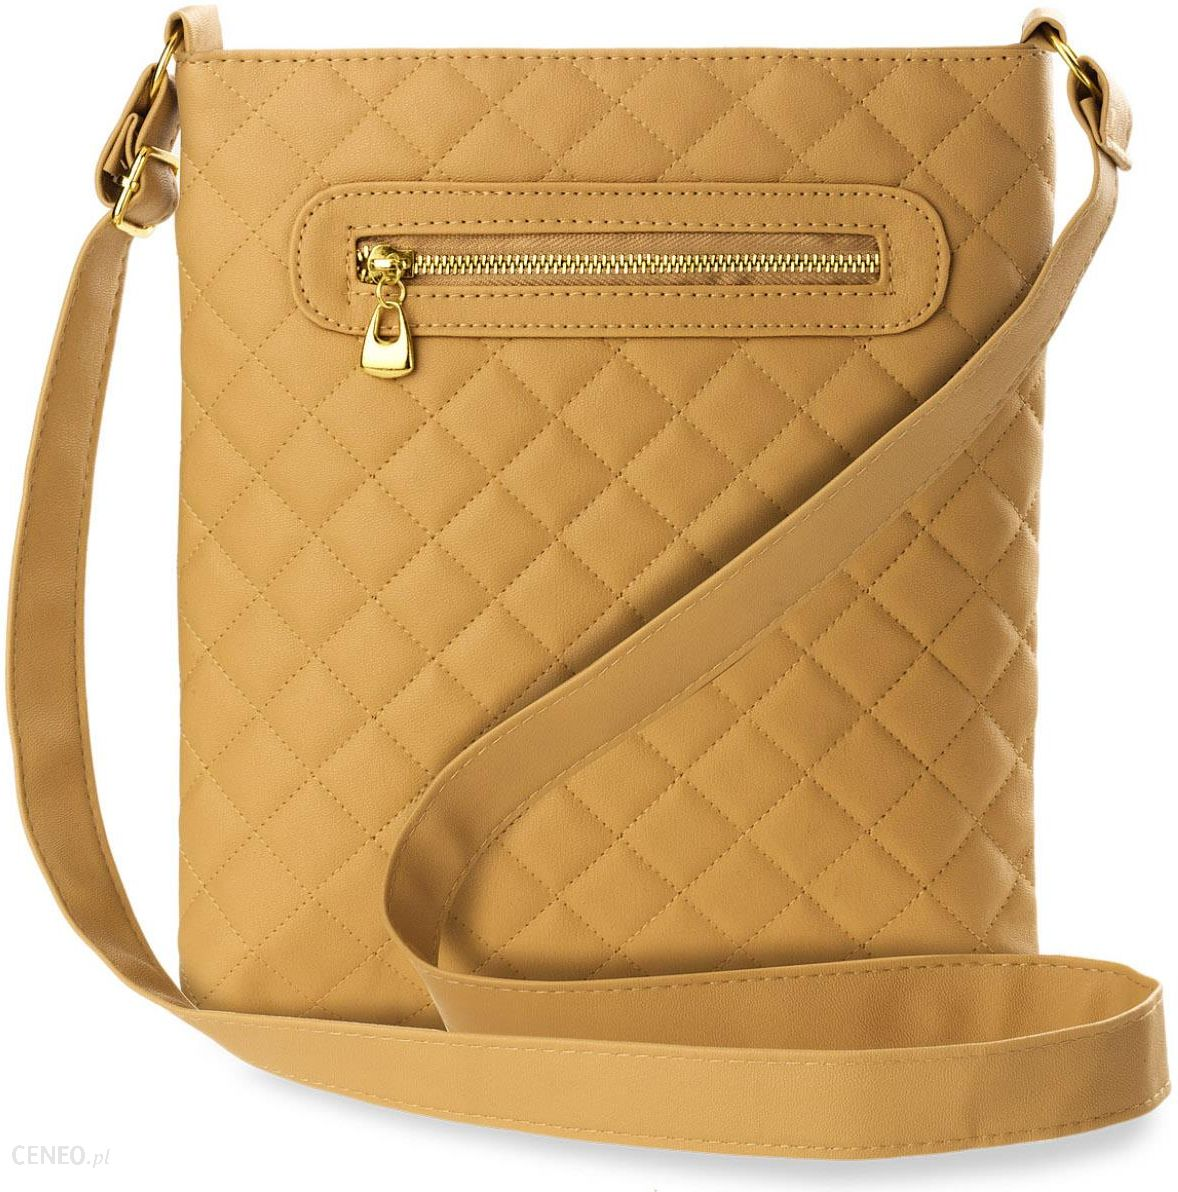 bd3e0d21a5ff1 Pikowana listonoszka klasyczna torebka damska na ramię - beżowy - zdjęcie 1